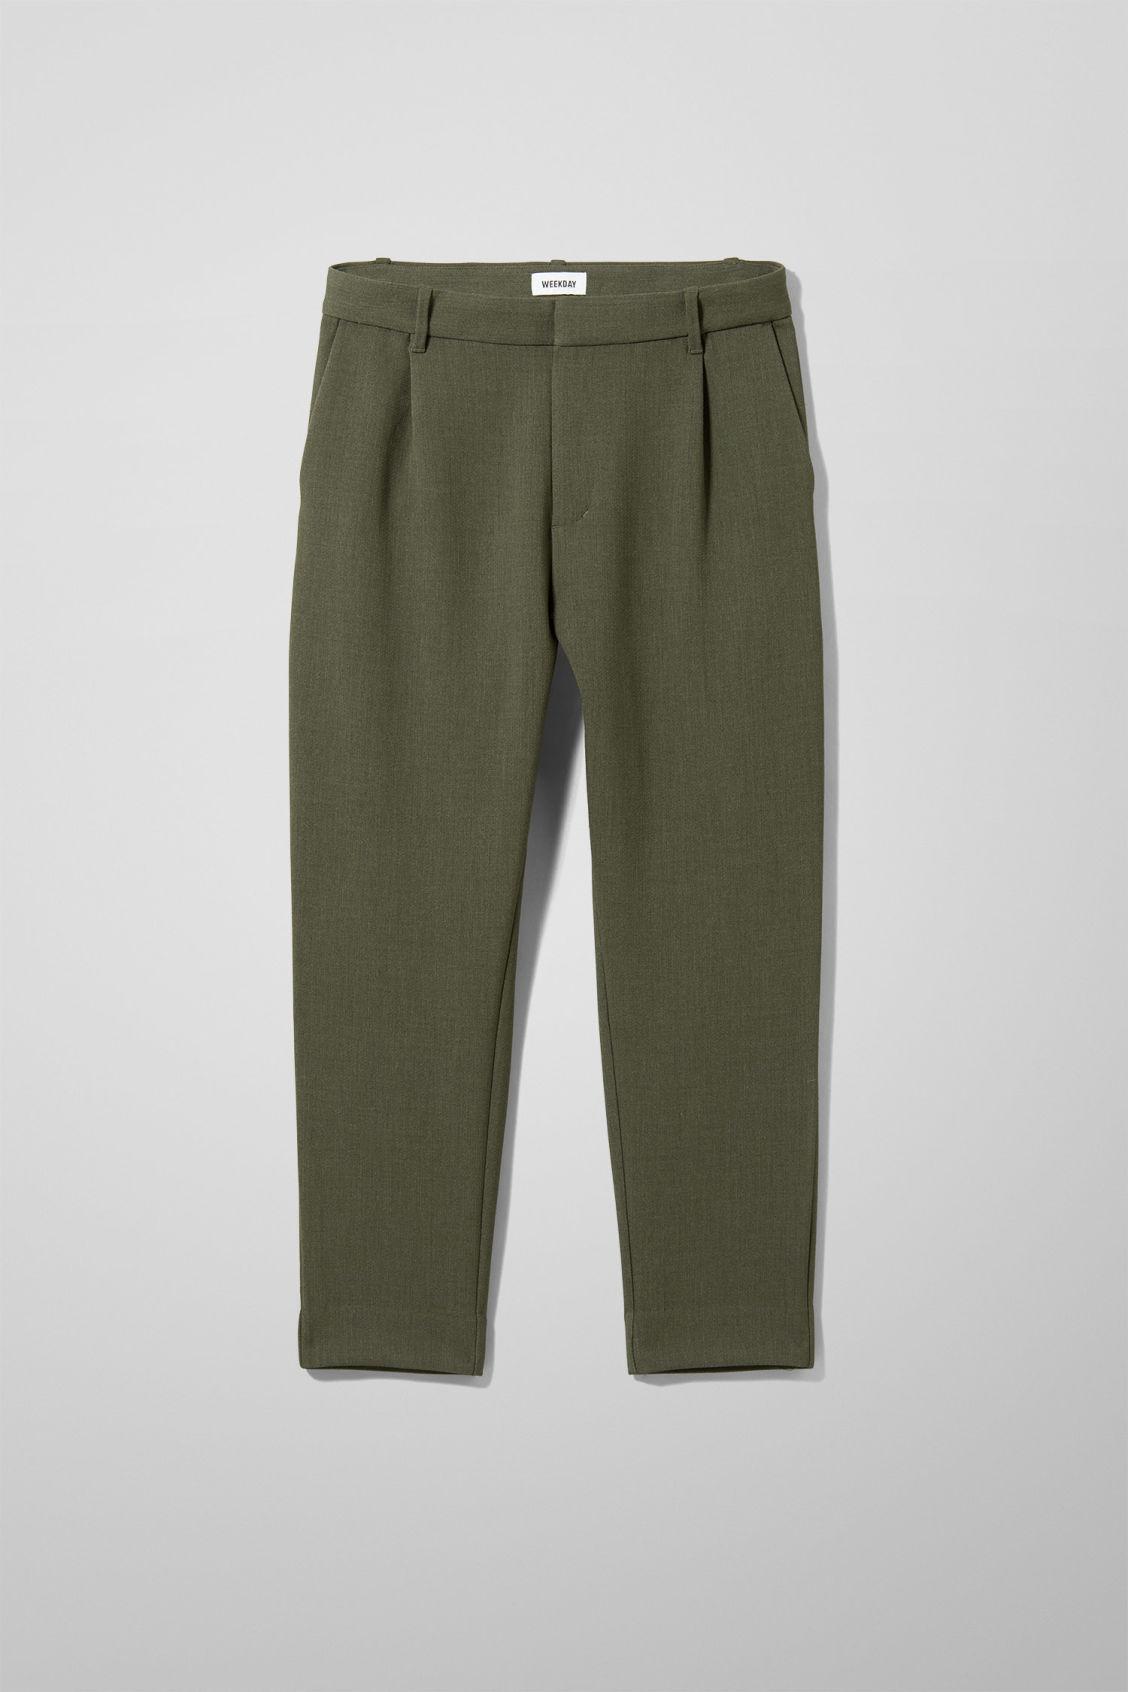 Mard Trousers - Green